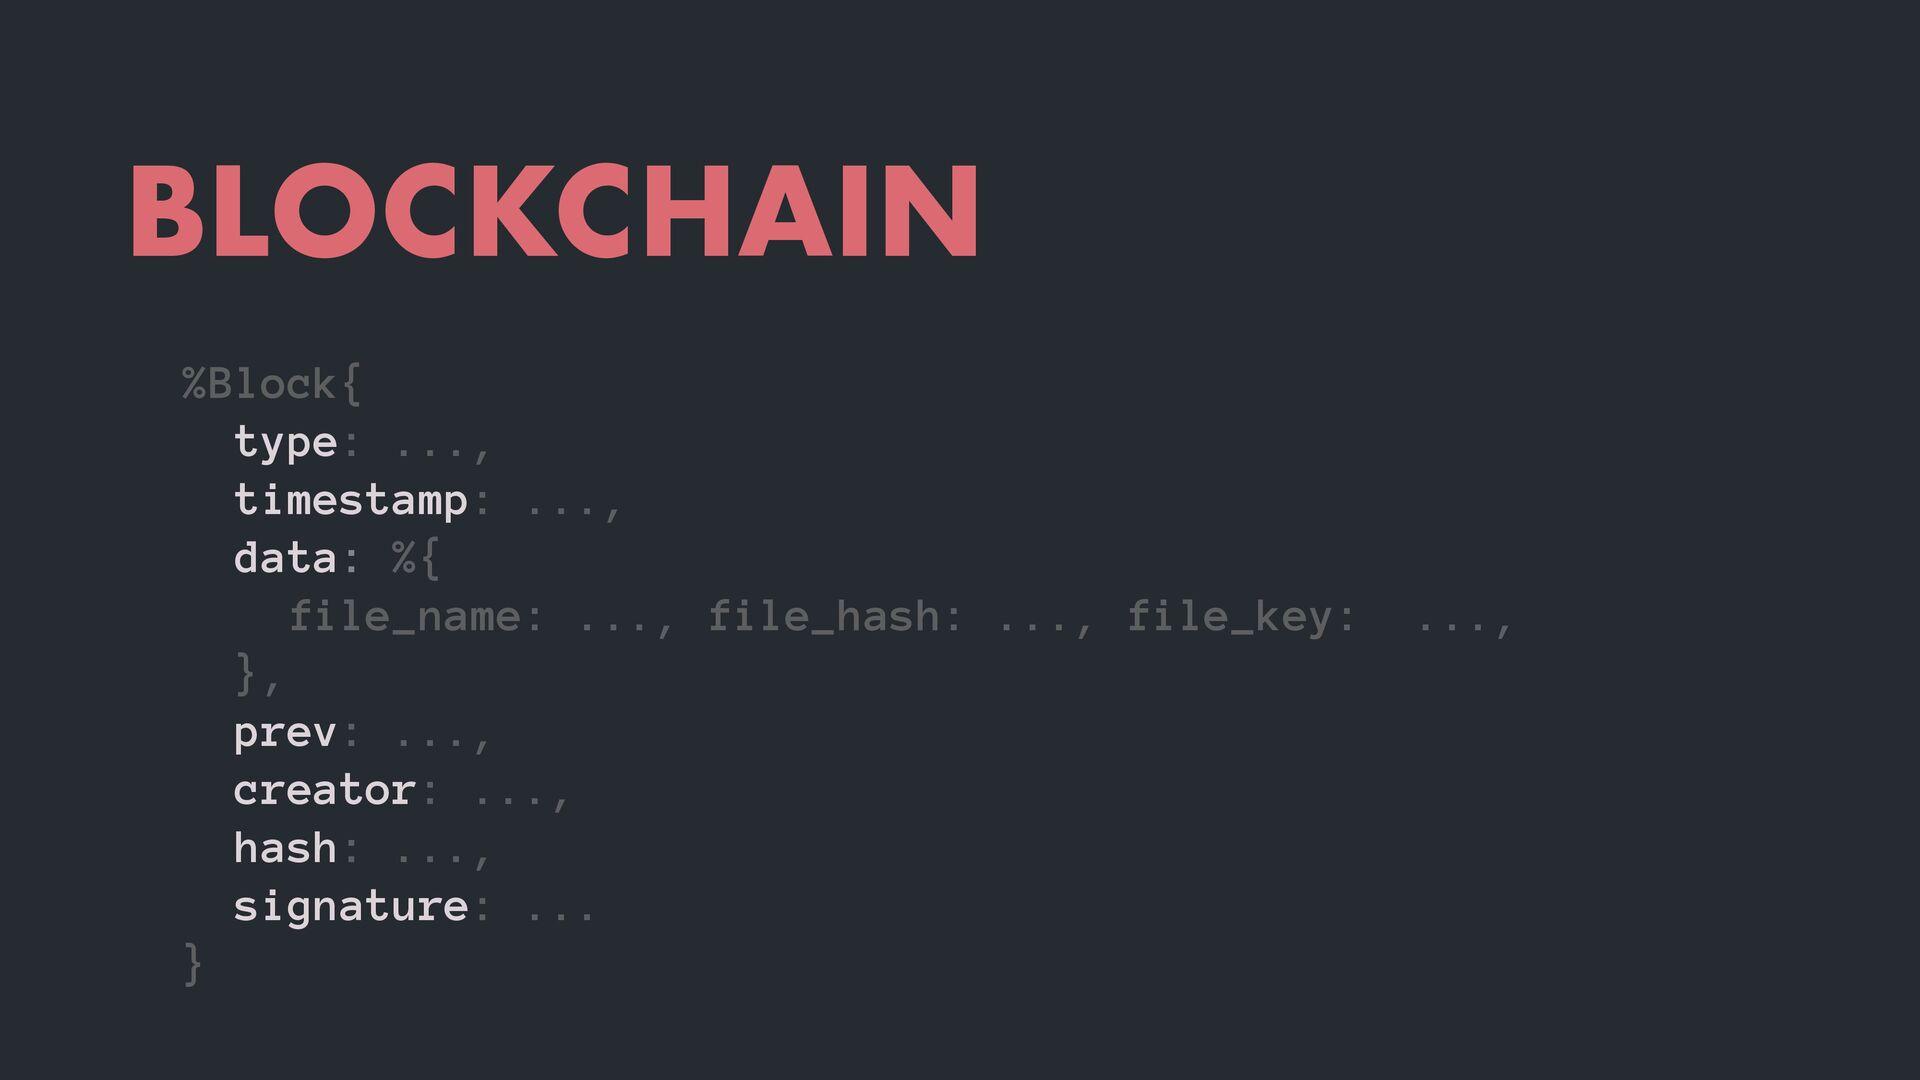 BLOCKCHAIN %Block{ type: ..., timestamp: ..., d...